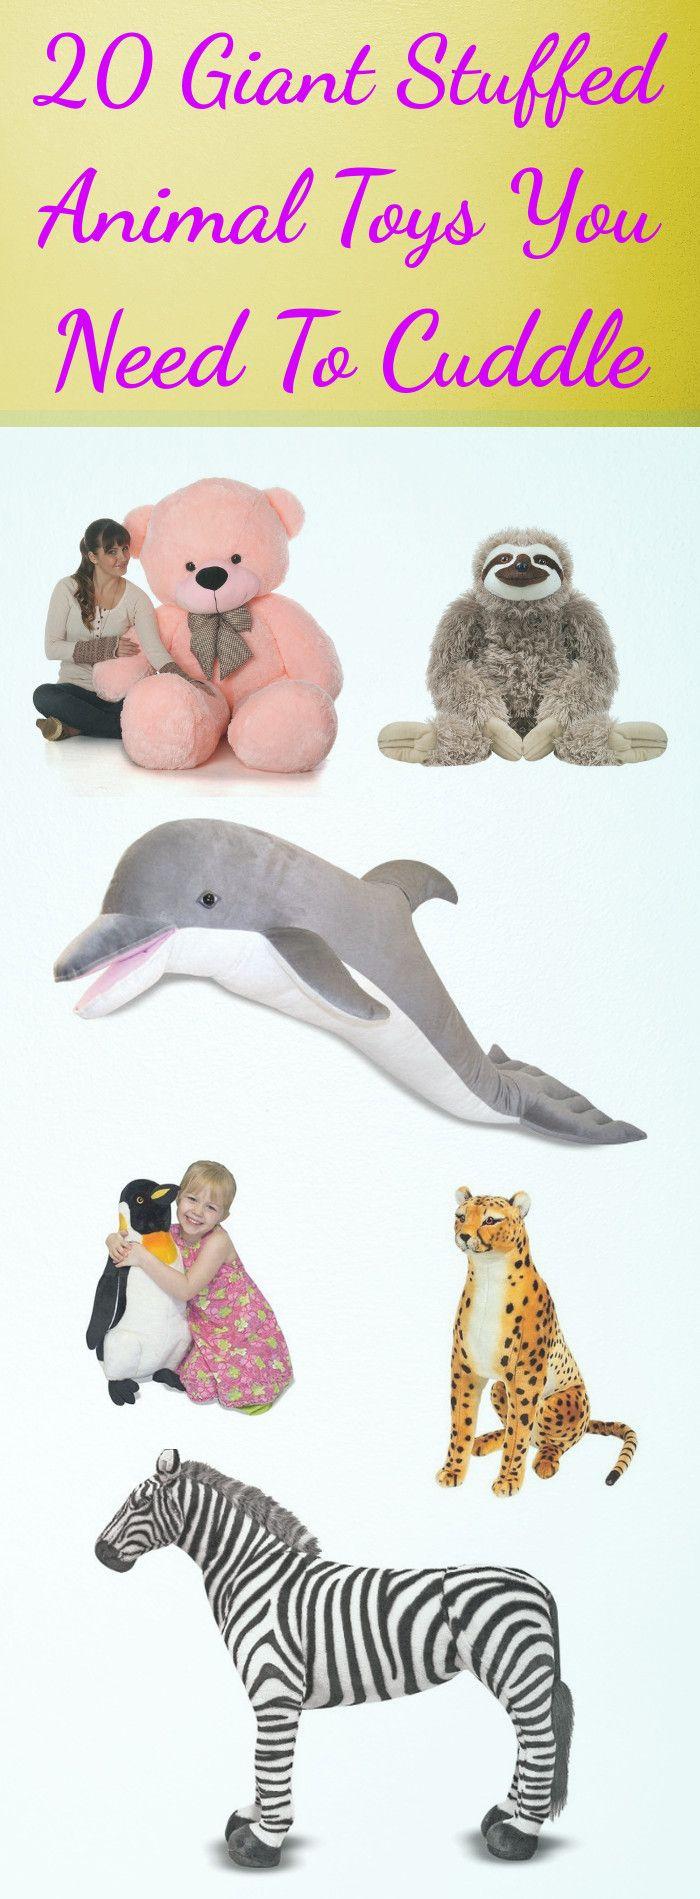 20 Giant Stuffed Animal Toys You Need To Cuddle Giant